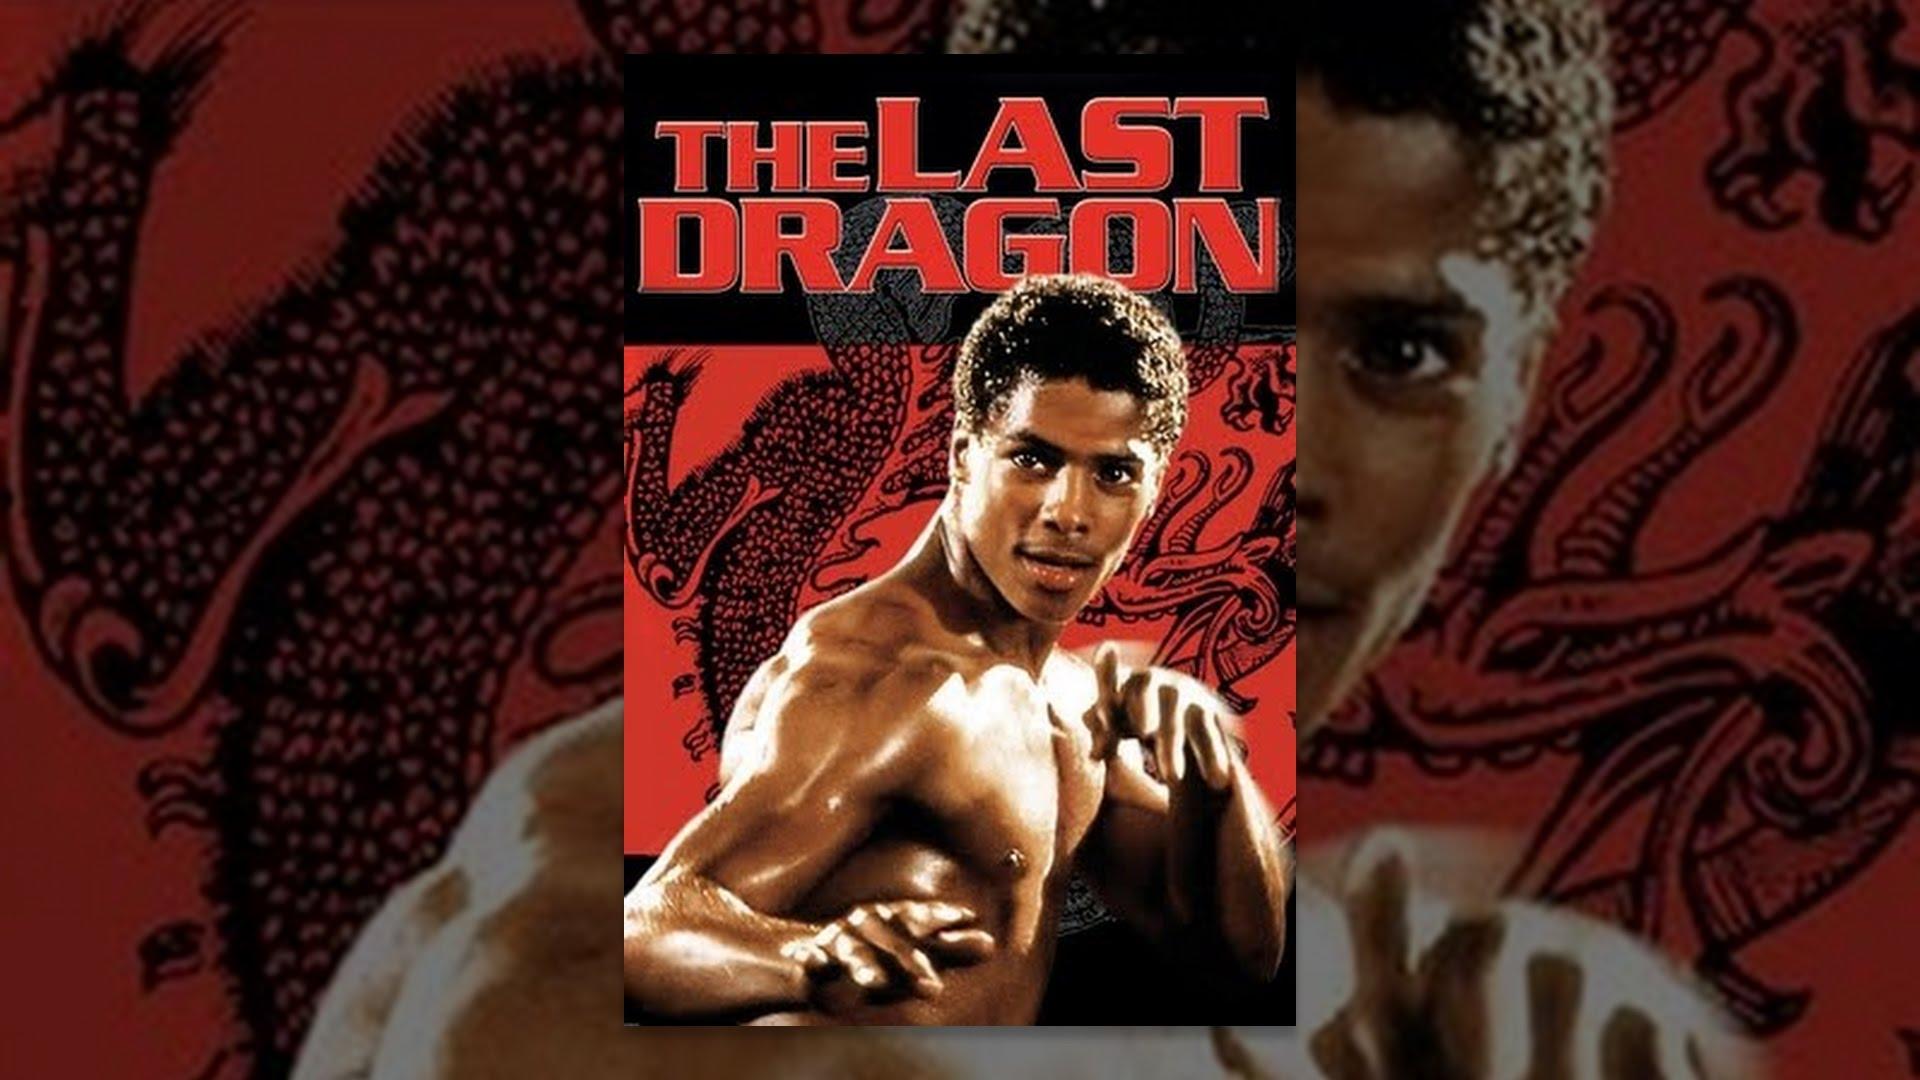 Last Dragon 1985